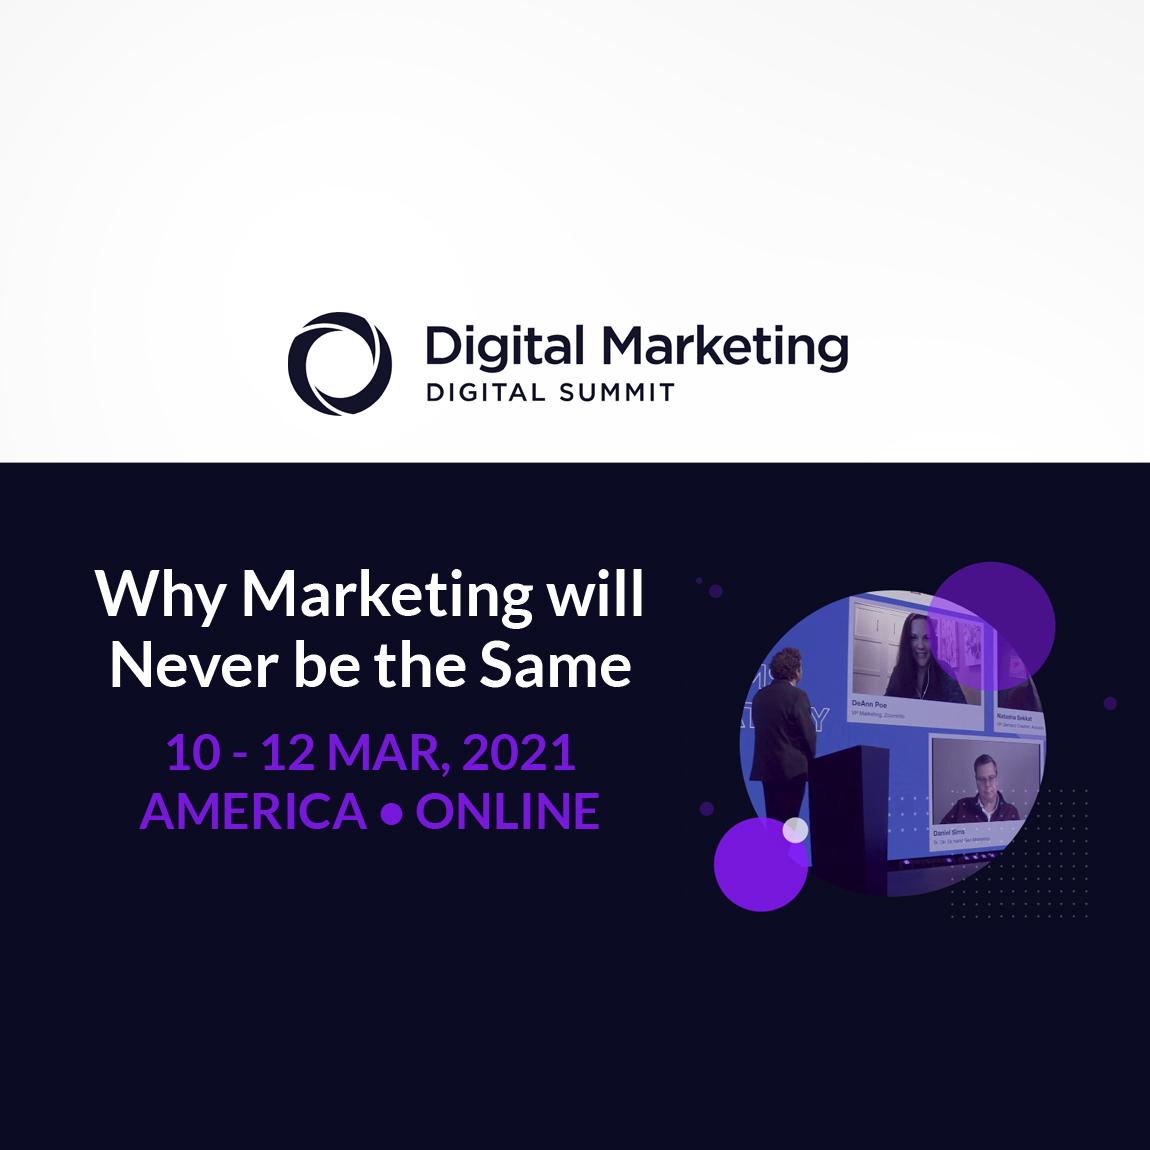 GDS Digital Marketing Summit: North America